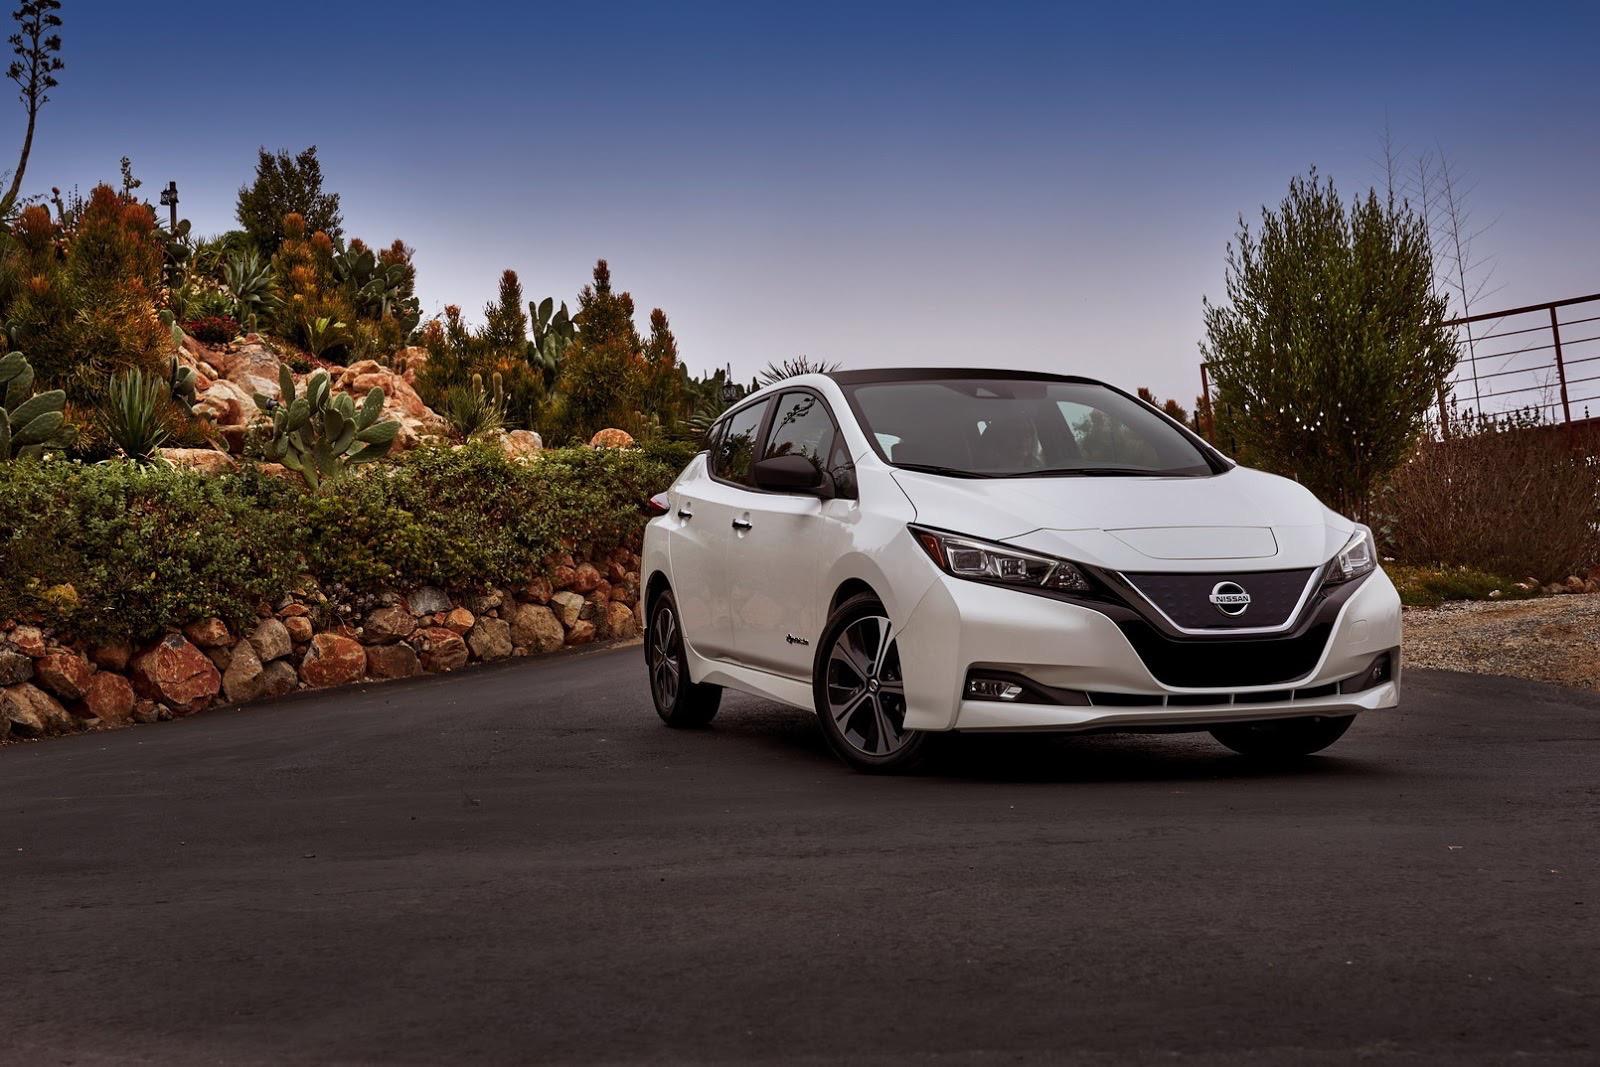 2018_Nissan_Leaf_03